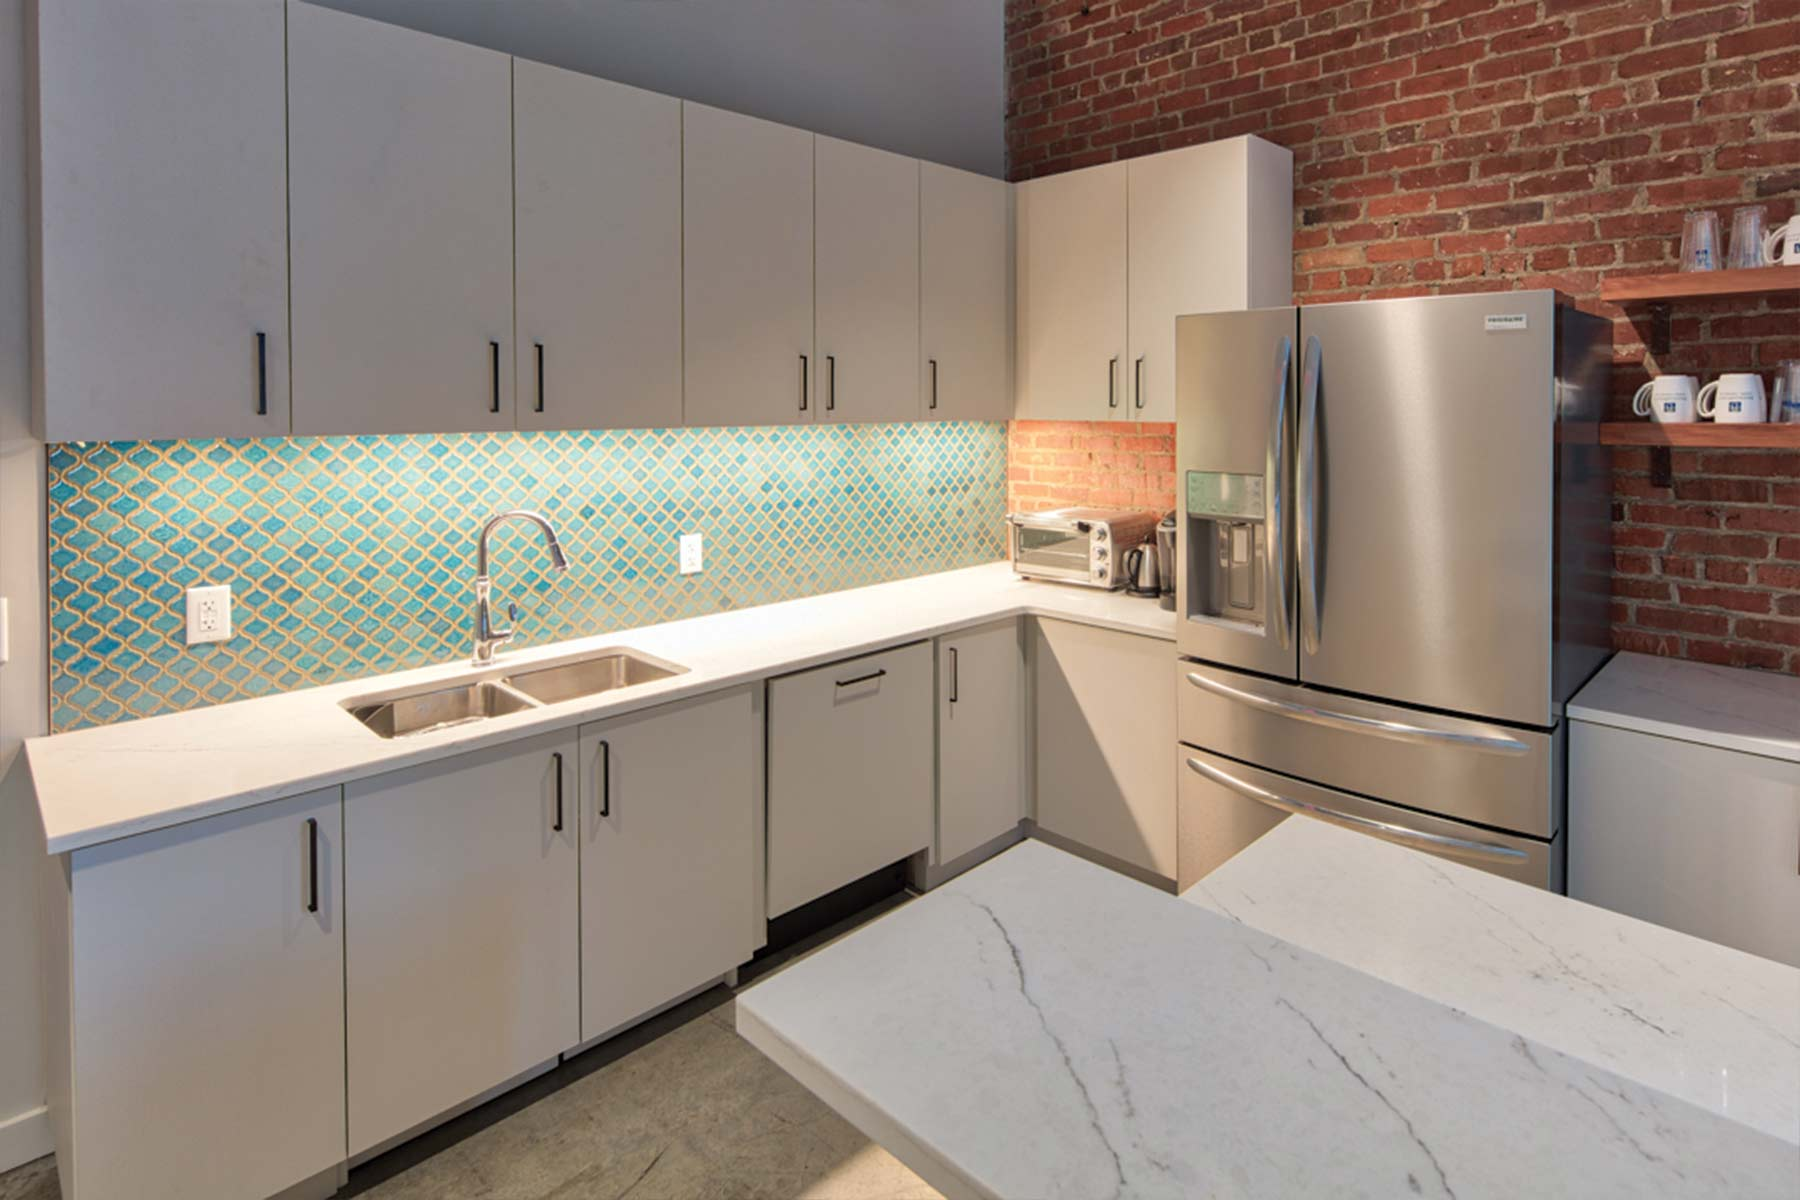 Bridgepoint, Tina Barnard Designs, LLC